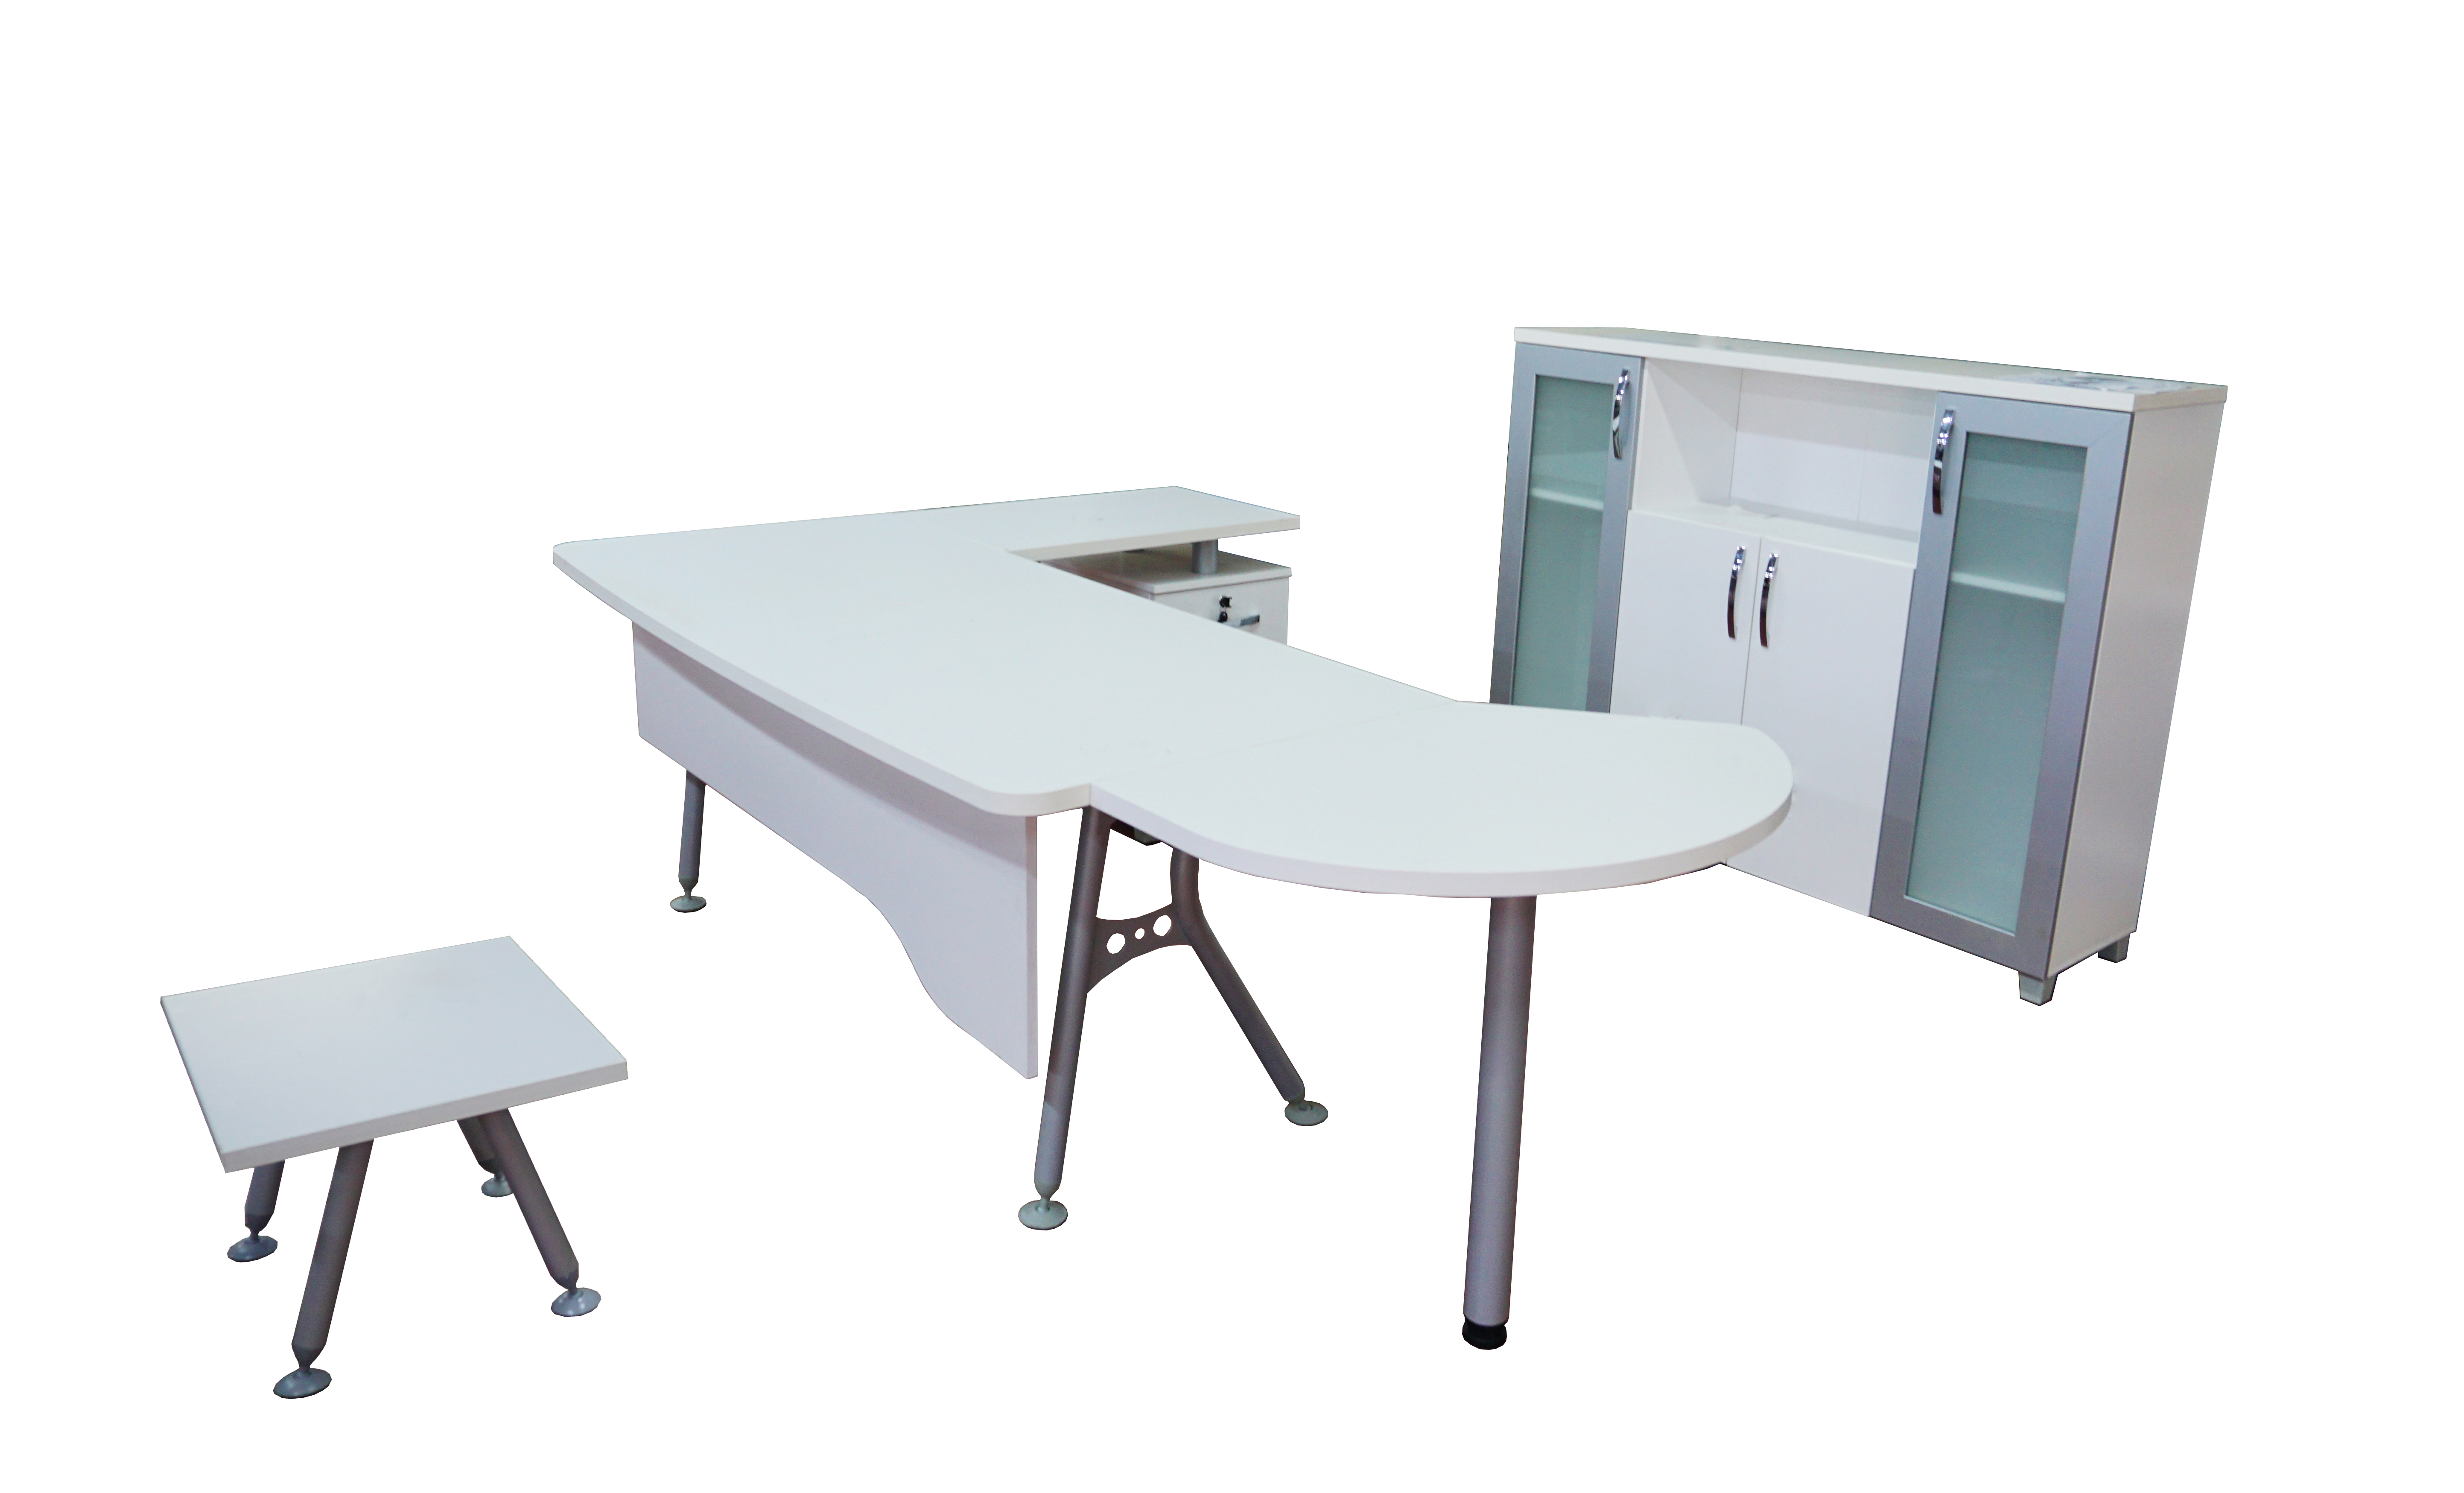 Marvelous Casa Mare Modern Clover 6 Piece L Shaped Desk Home Office Suite Furniture Set 63 71 White Metalic Grey Home Designer Goods Beutiful Home Inspiration Truamahrainfo